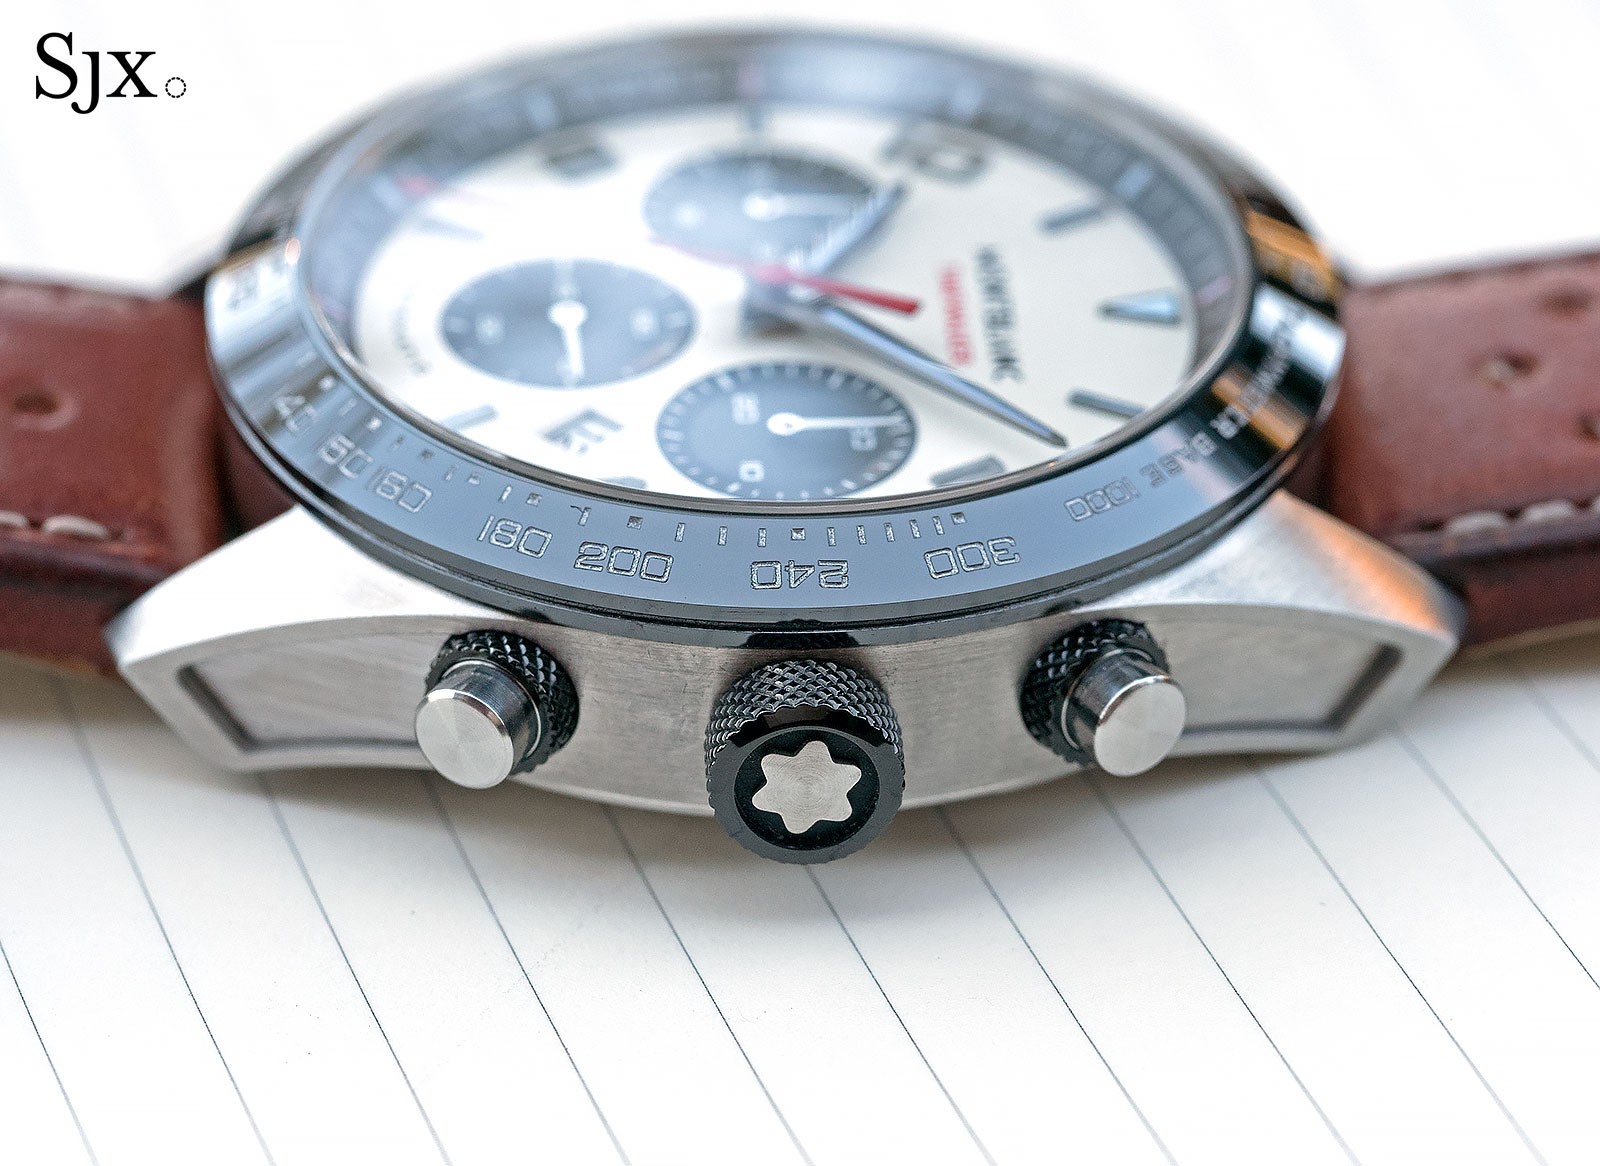 Montblanc Montblanc TimeWalker Manufacture Chronograph 5